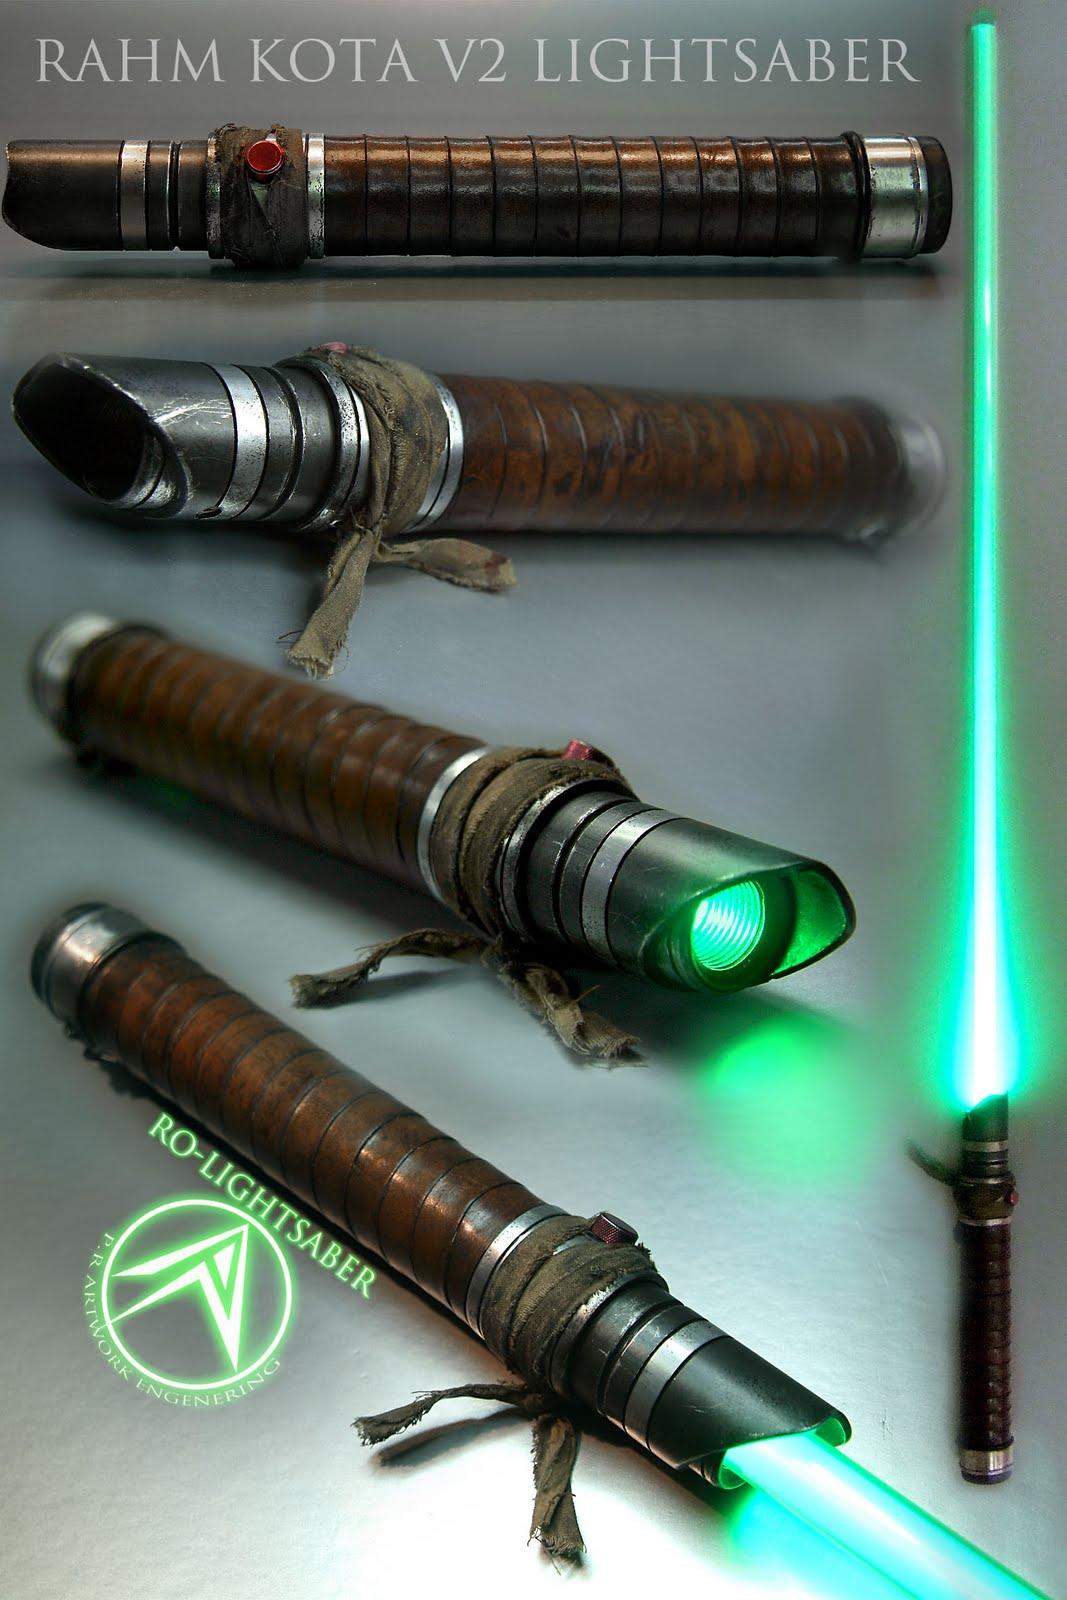 Ro lightsabers